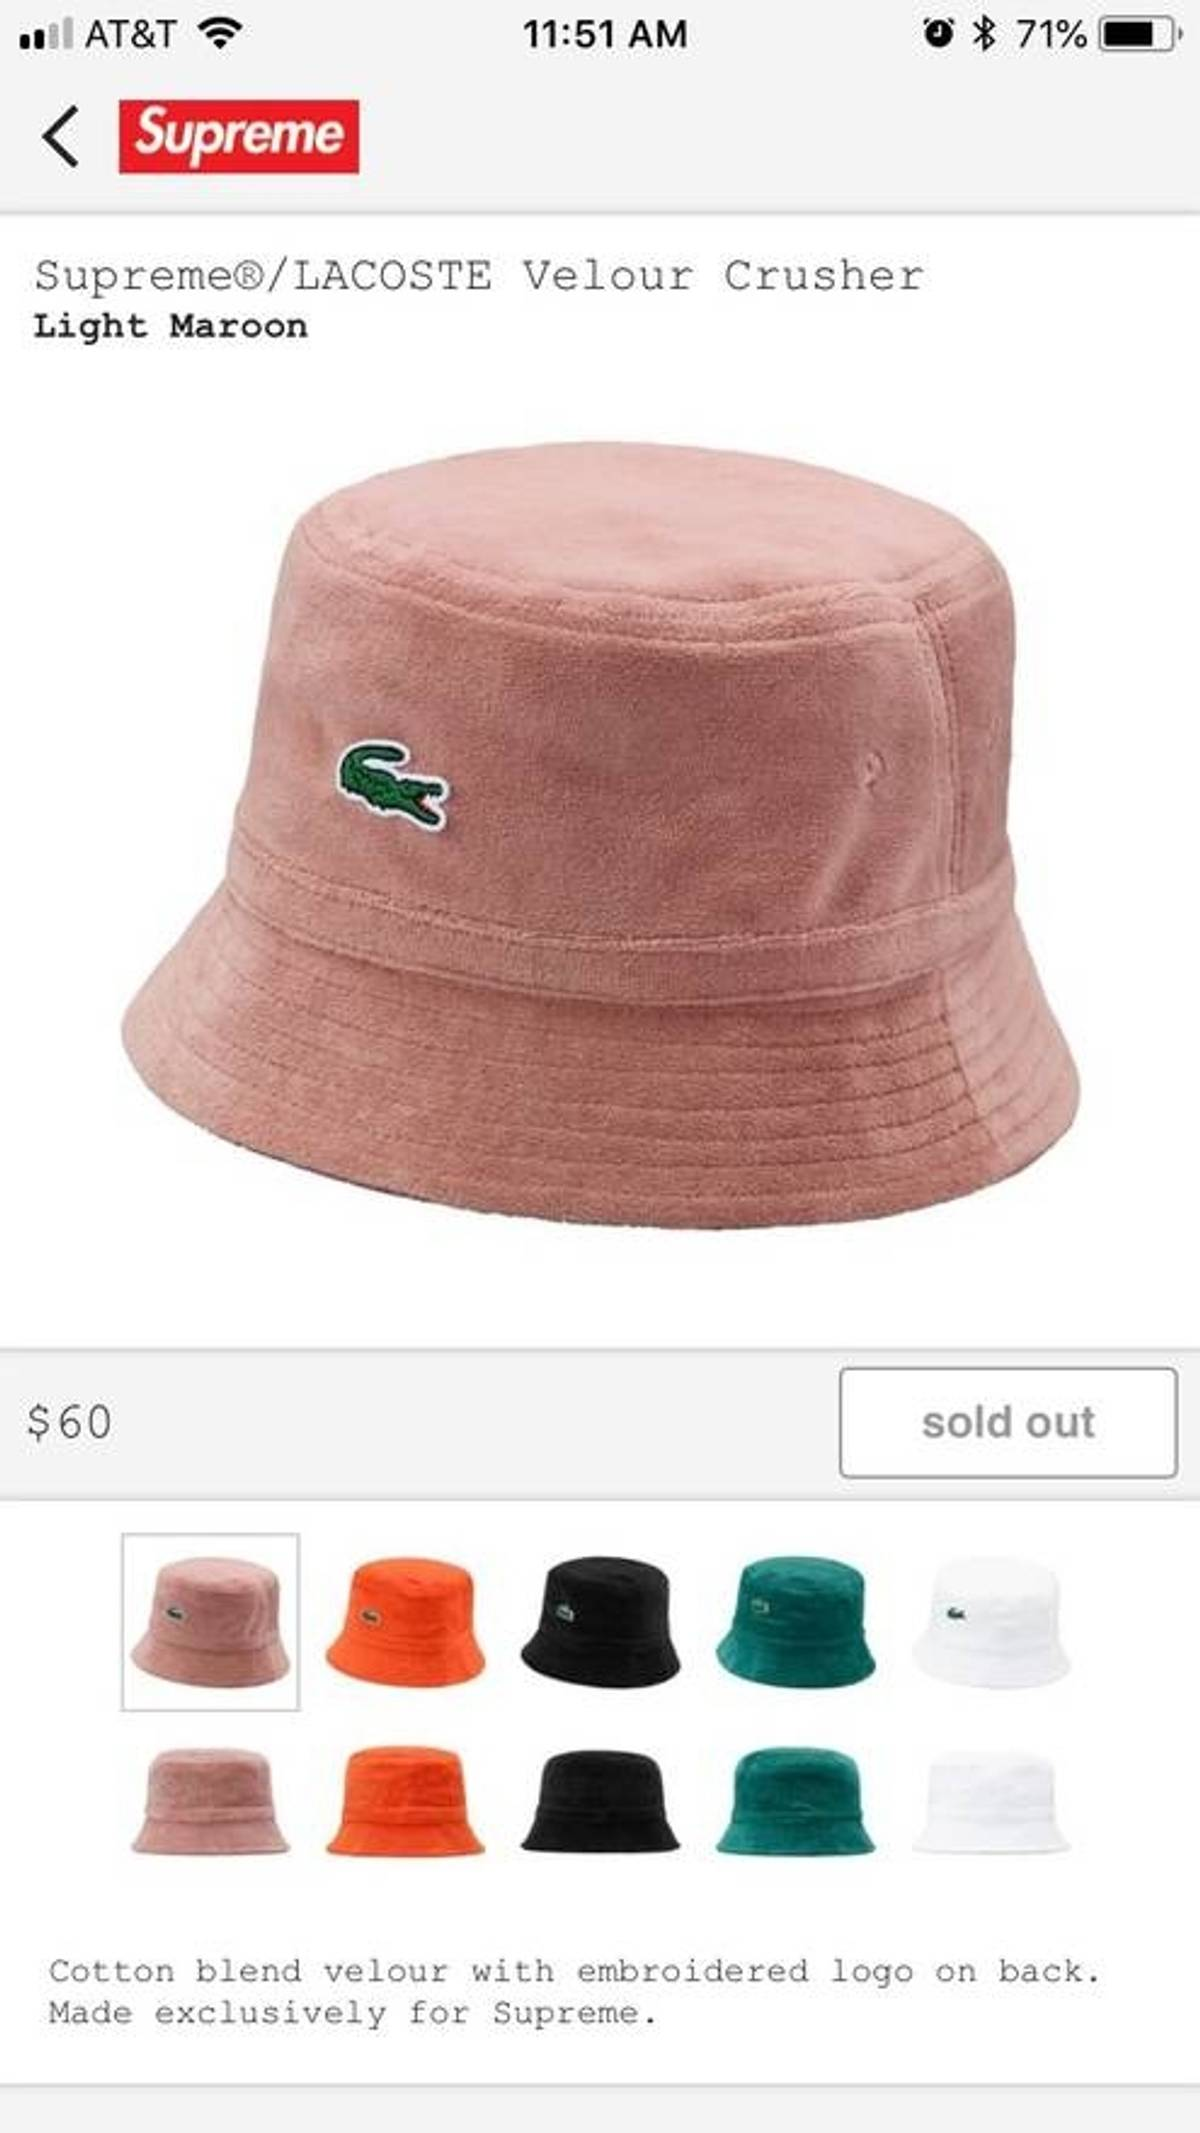 e6c38effd1ec6a Supreme Supreme X Lacoste Velvet Bucket Hat, Light Maroon   Grailed